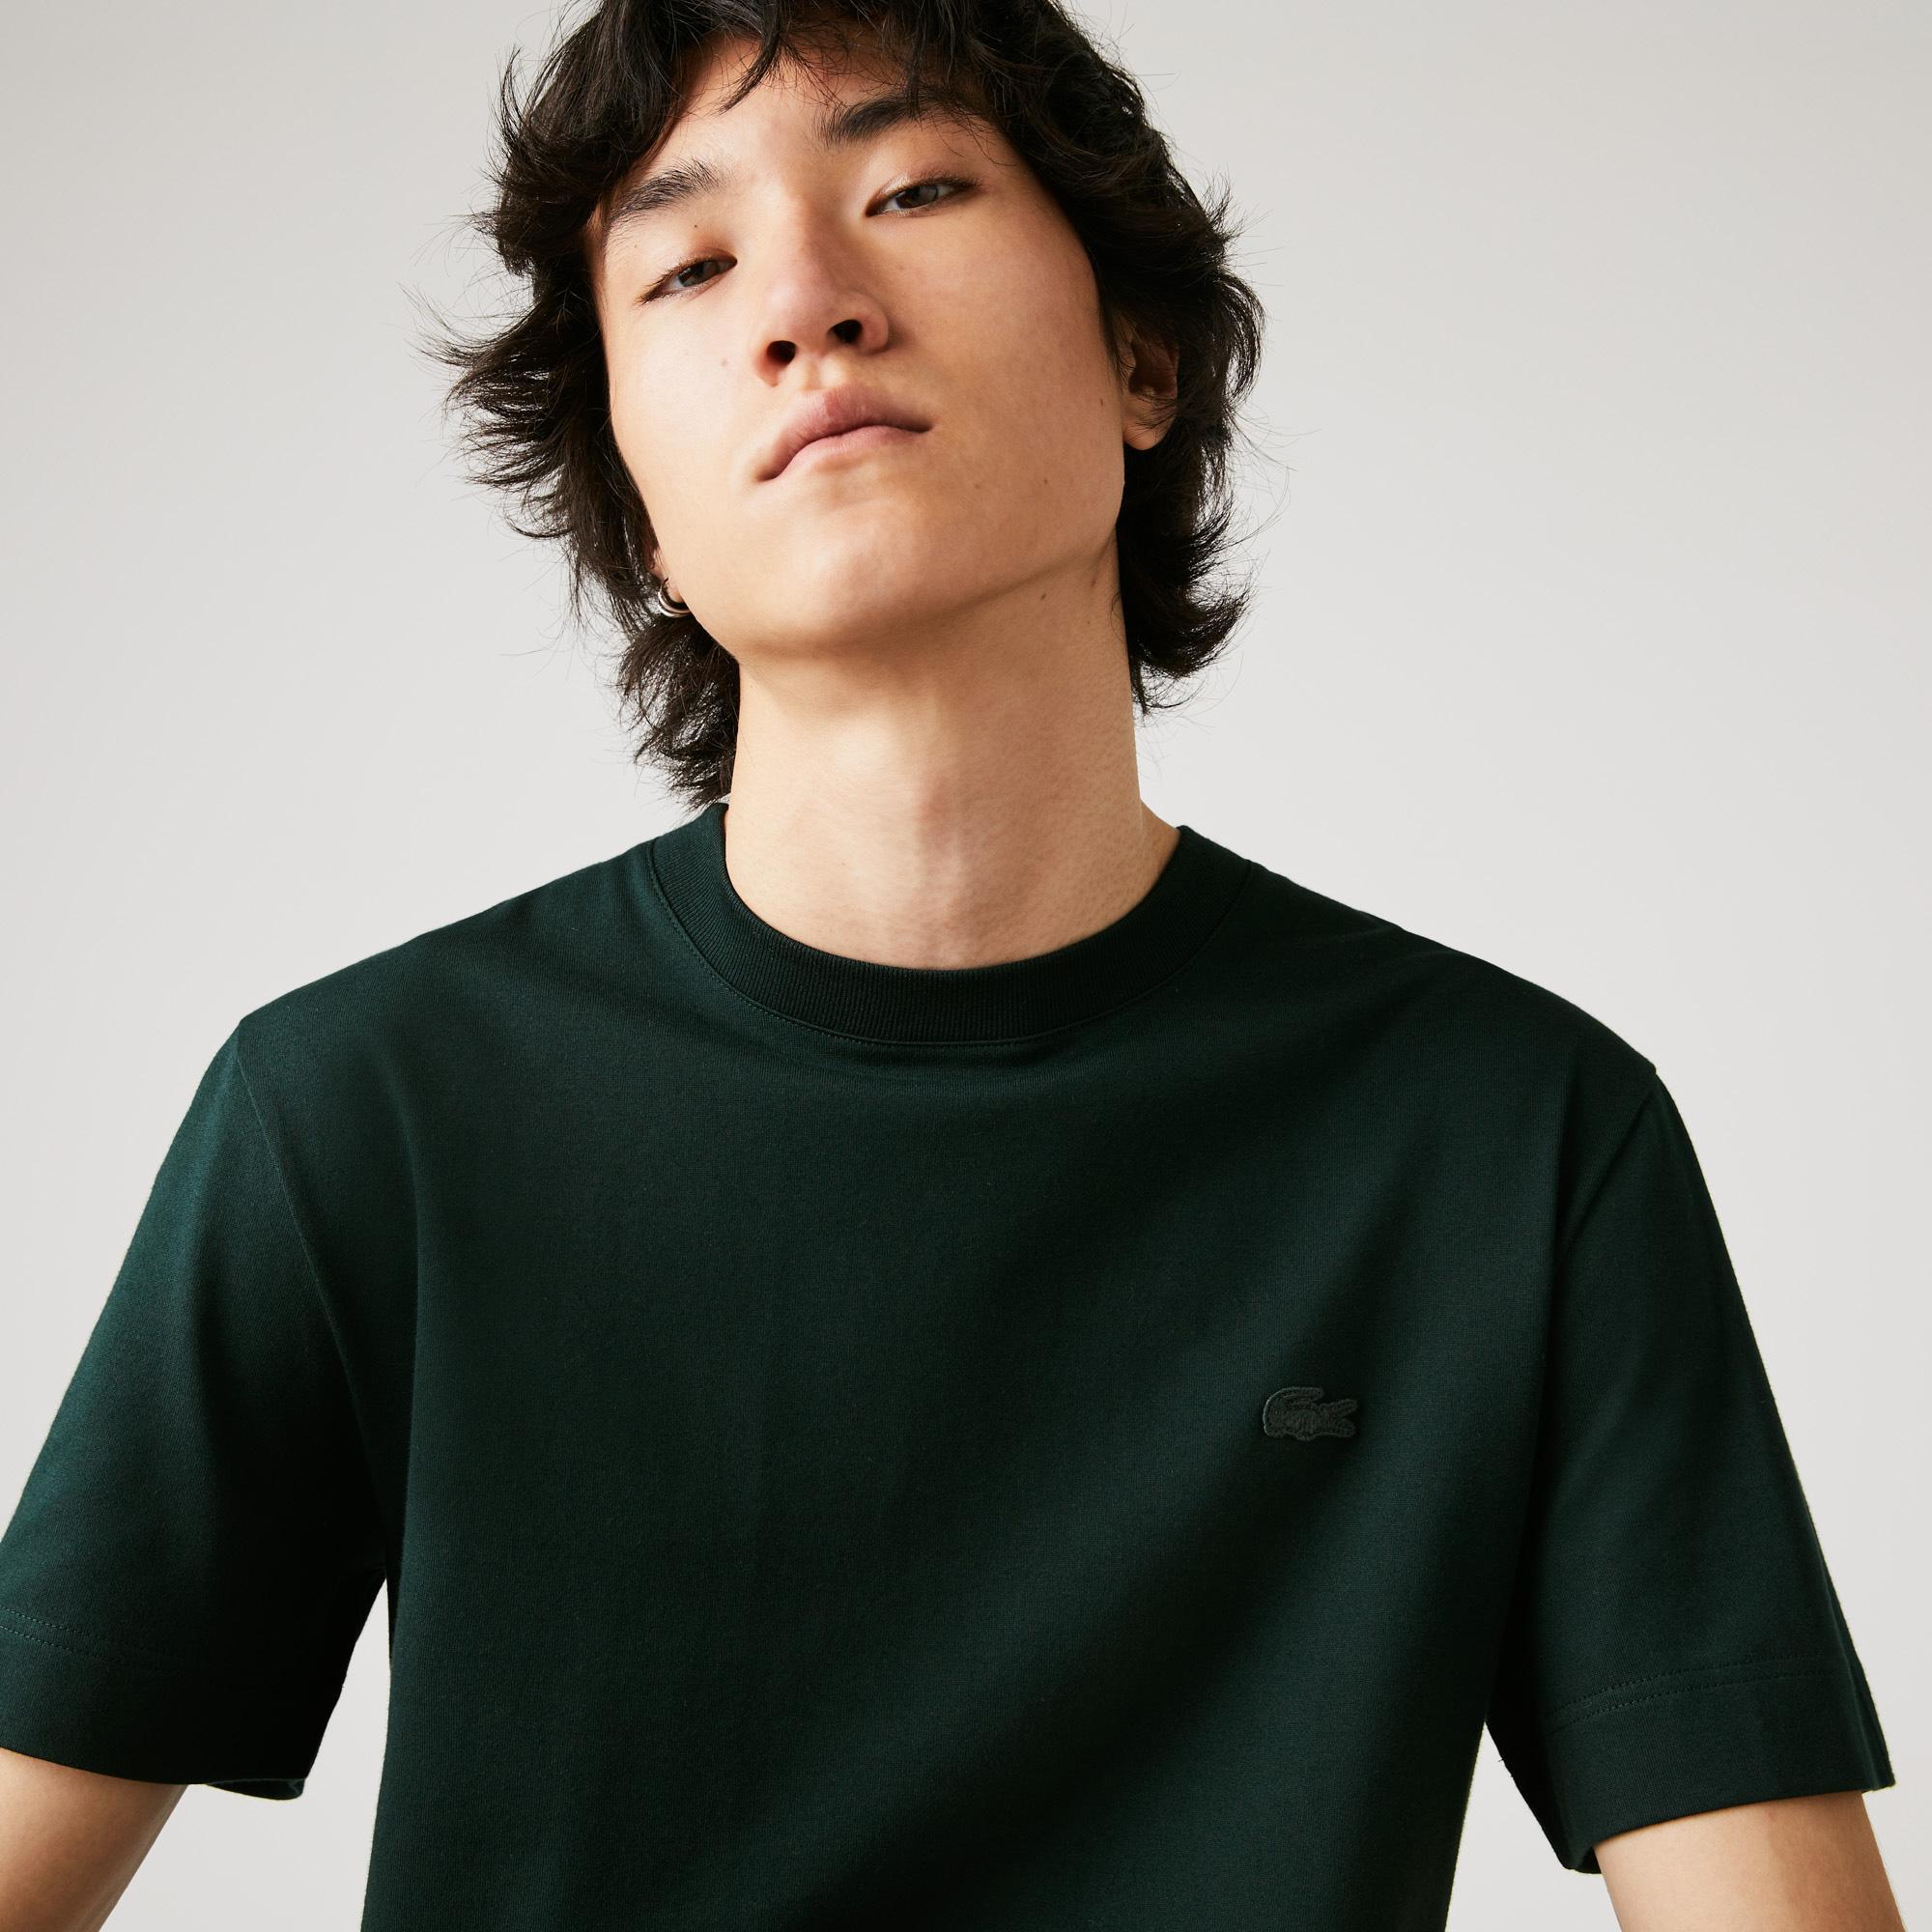 Lacoste Erkek Bisiklet Yaka Haki T-Shirt